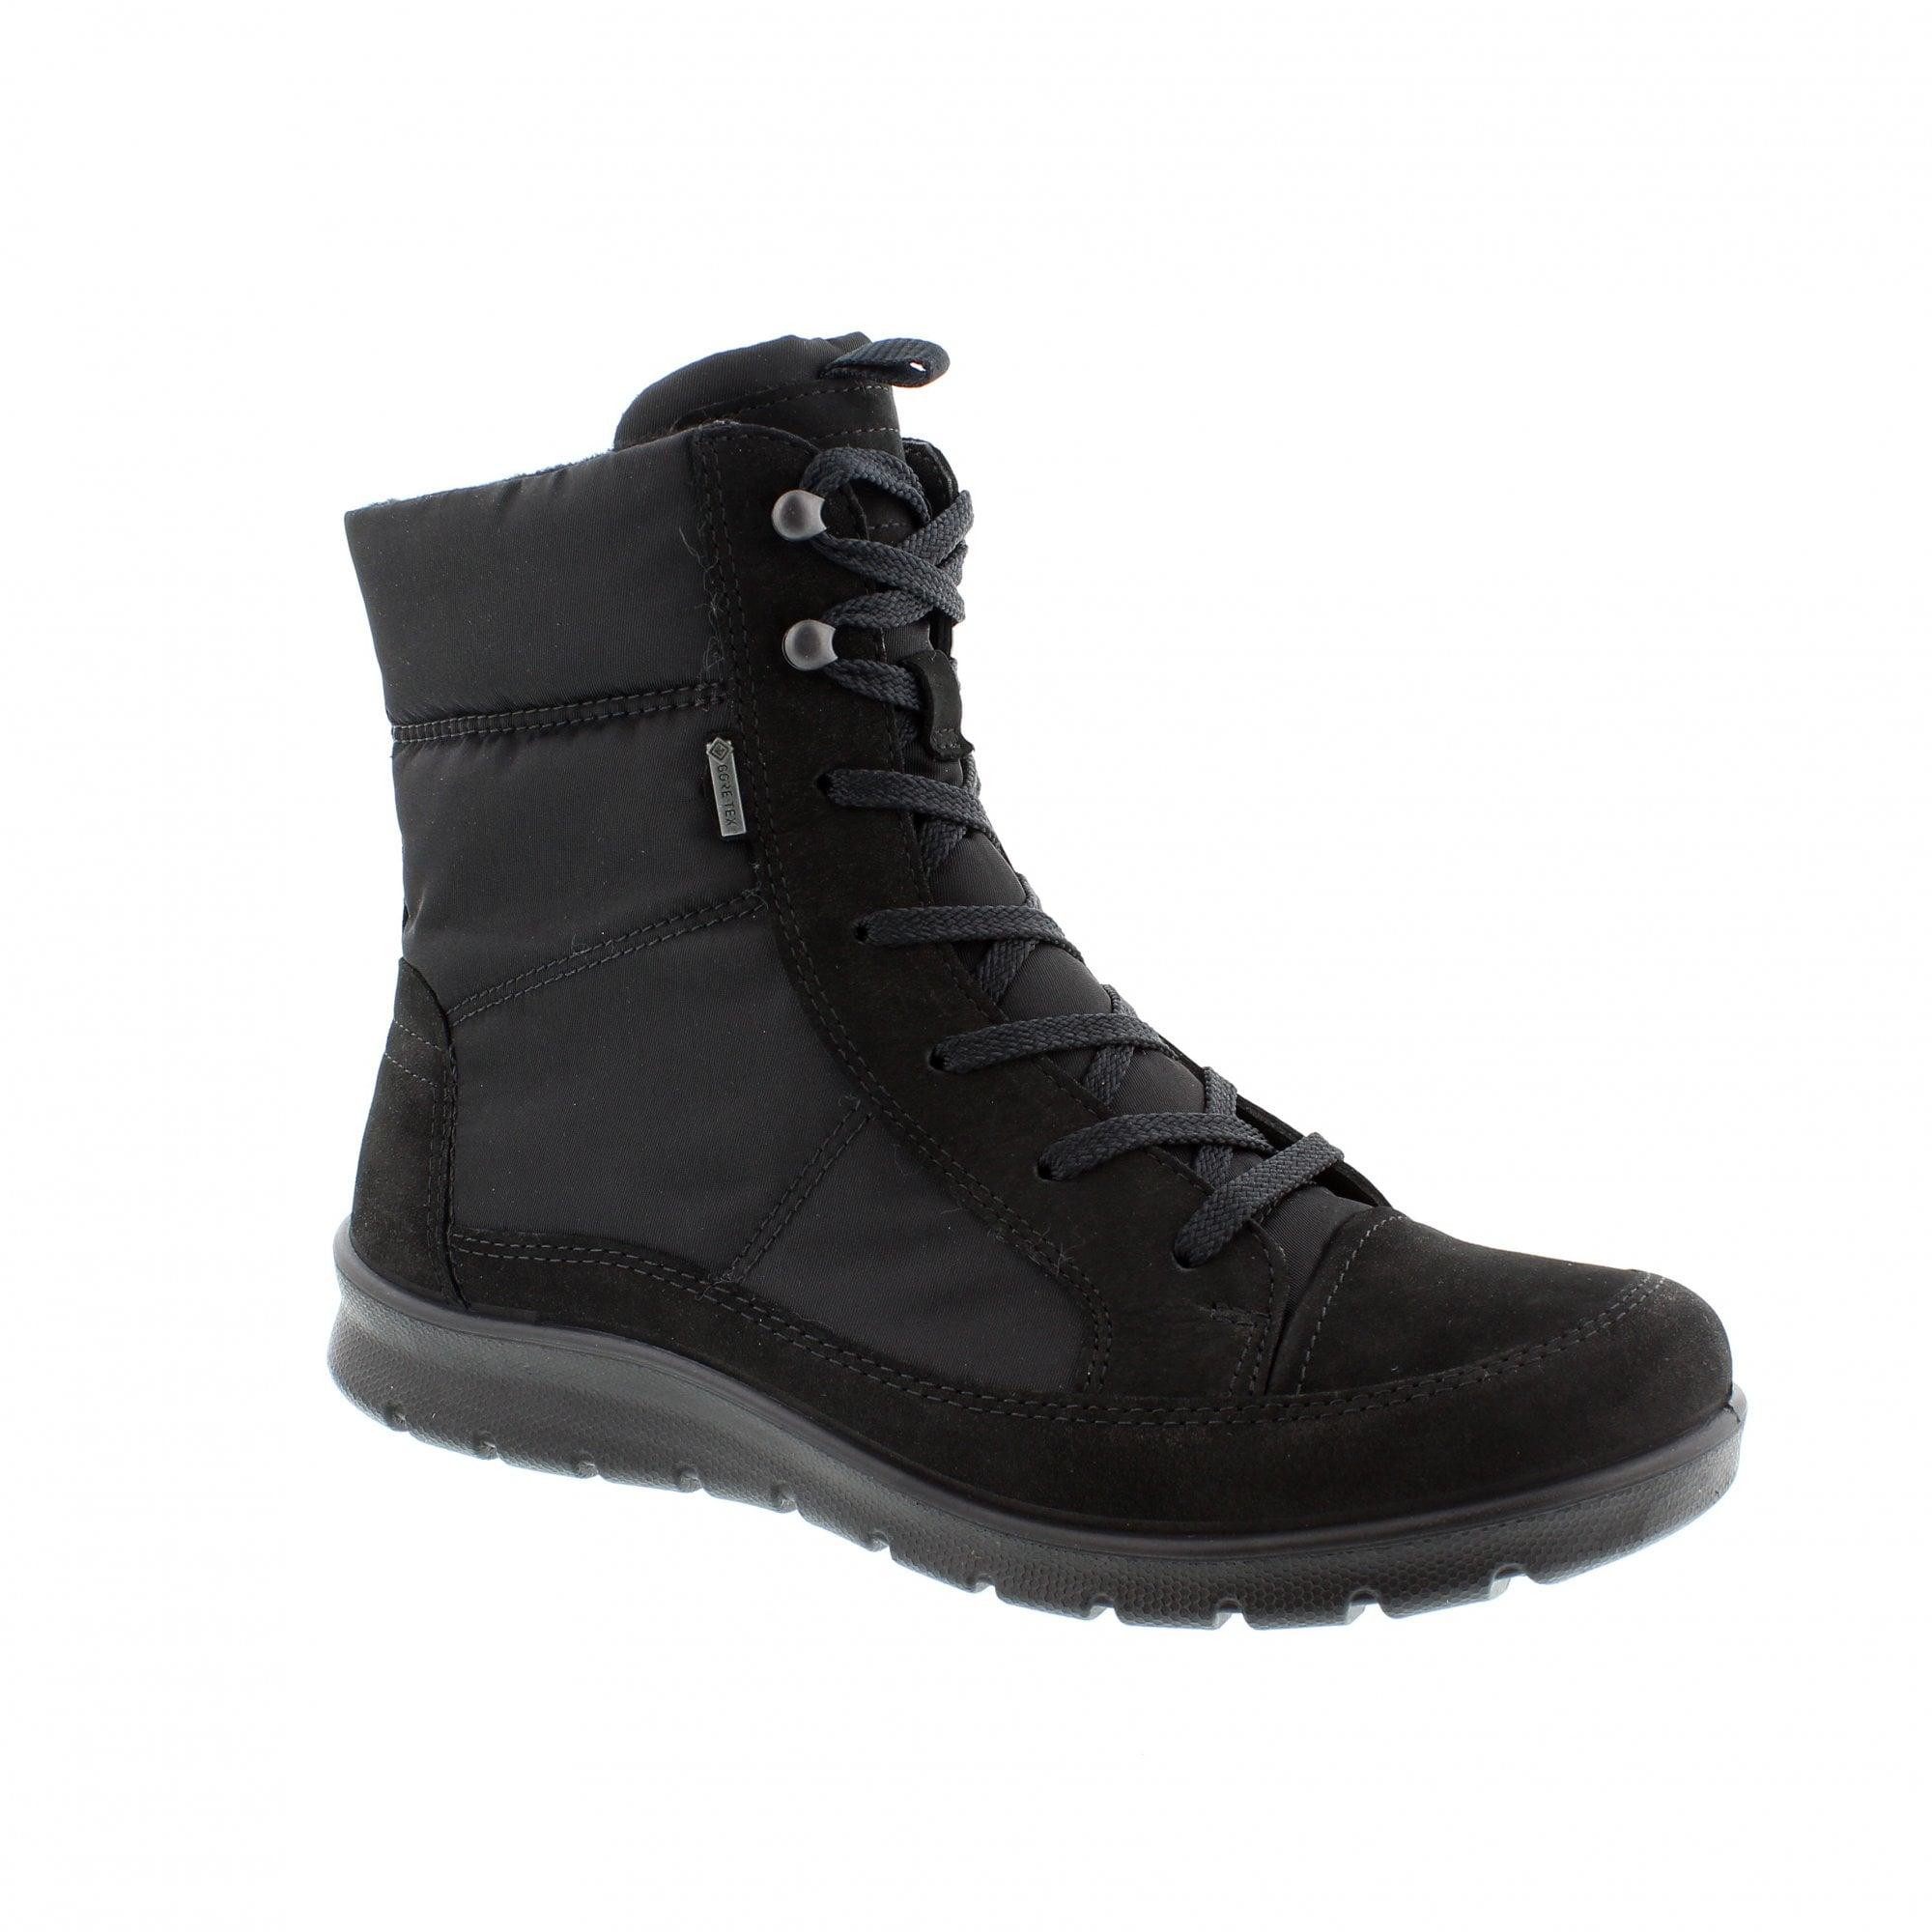 affba695412 Ecco Babett 215553-02001 Womens Ankle Boots